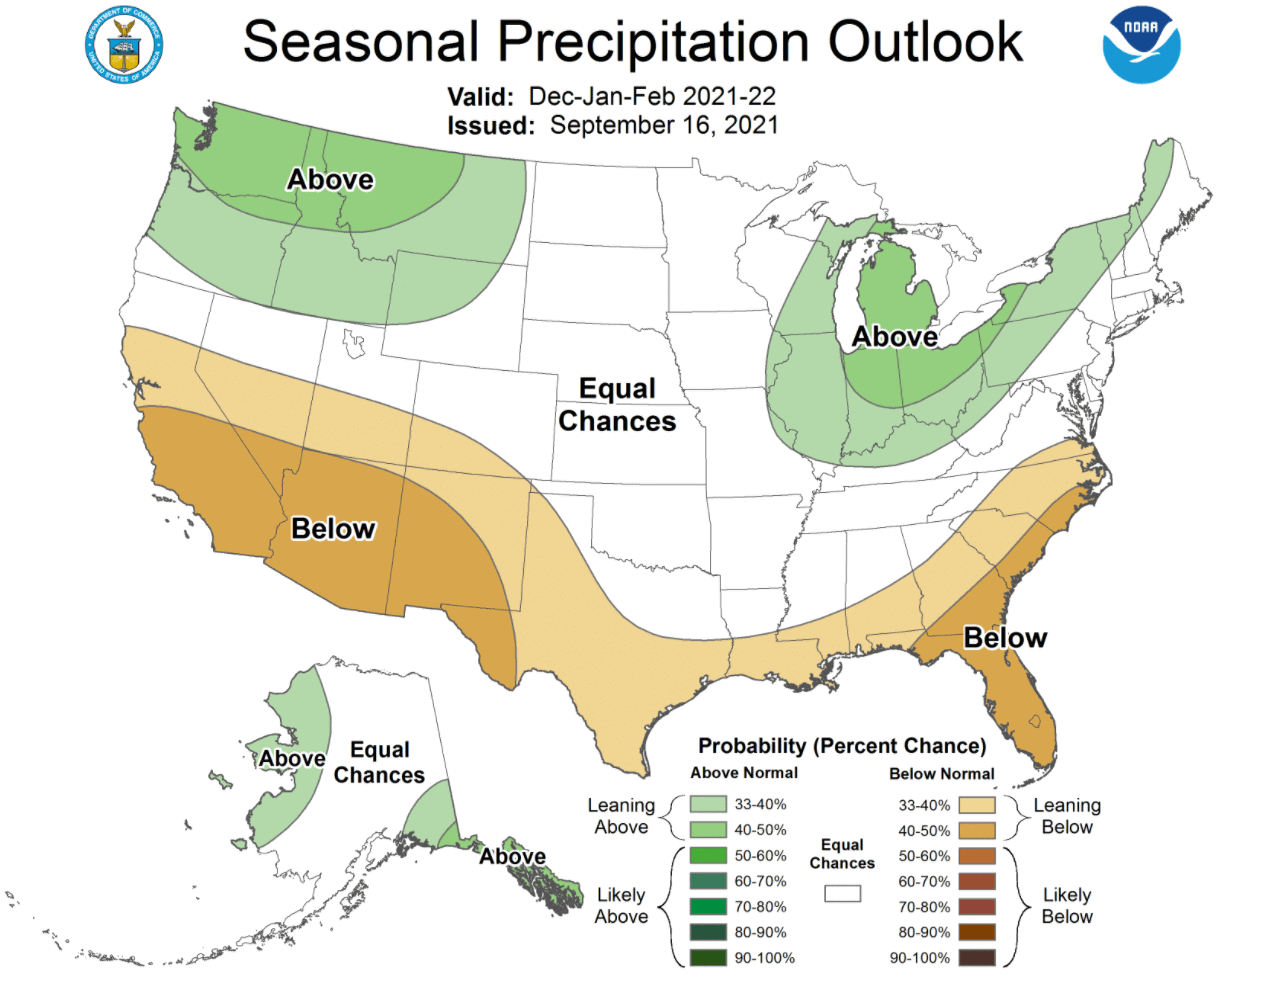 winter-season-official-weather-noaa-united-states-precipiation-forecast